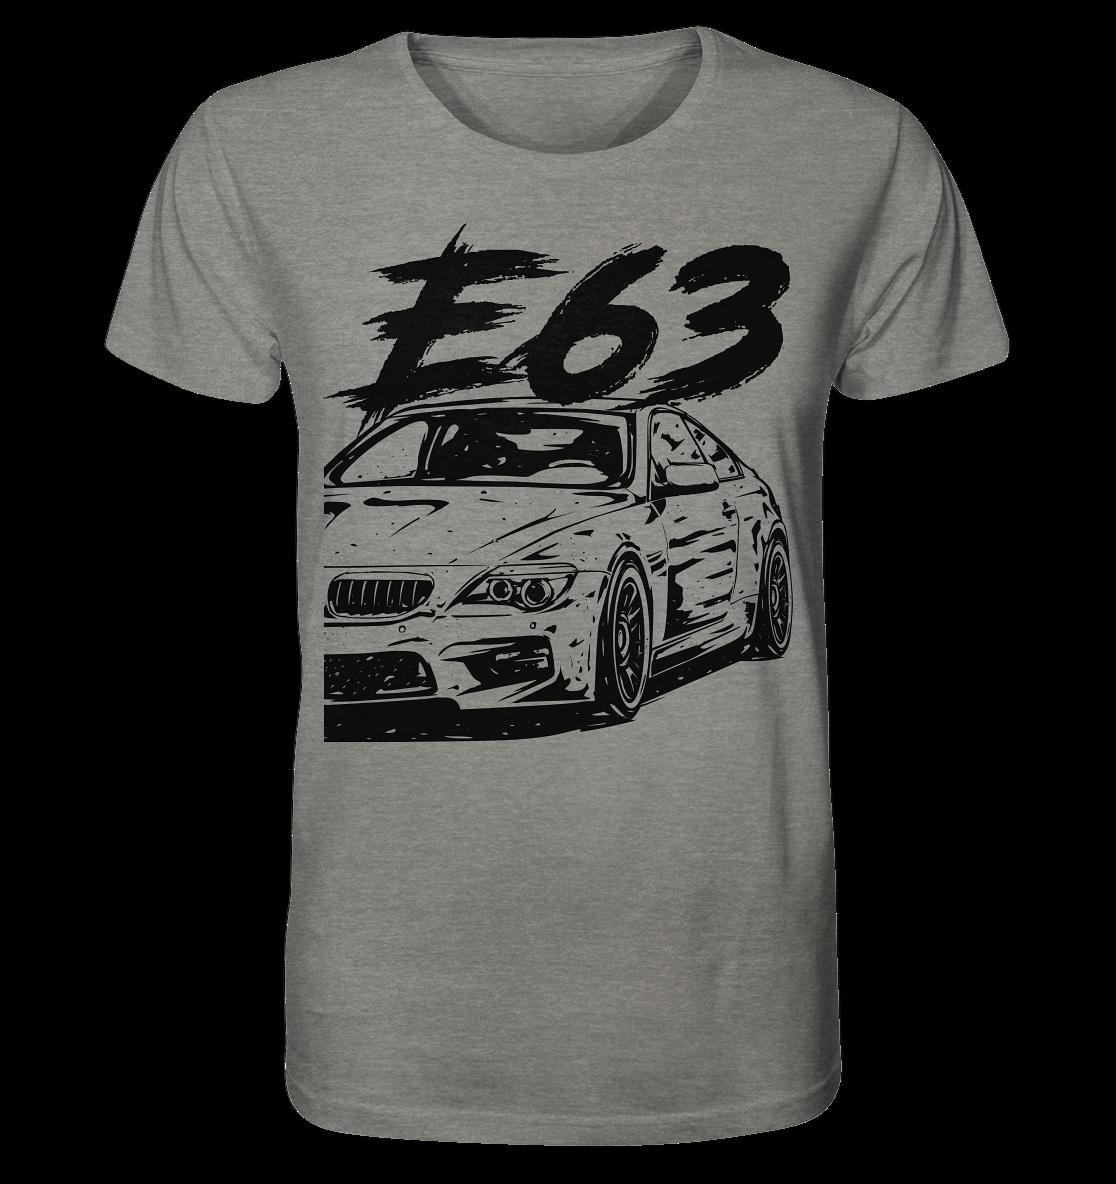 Camisa glstkrrn e63 t